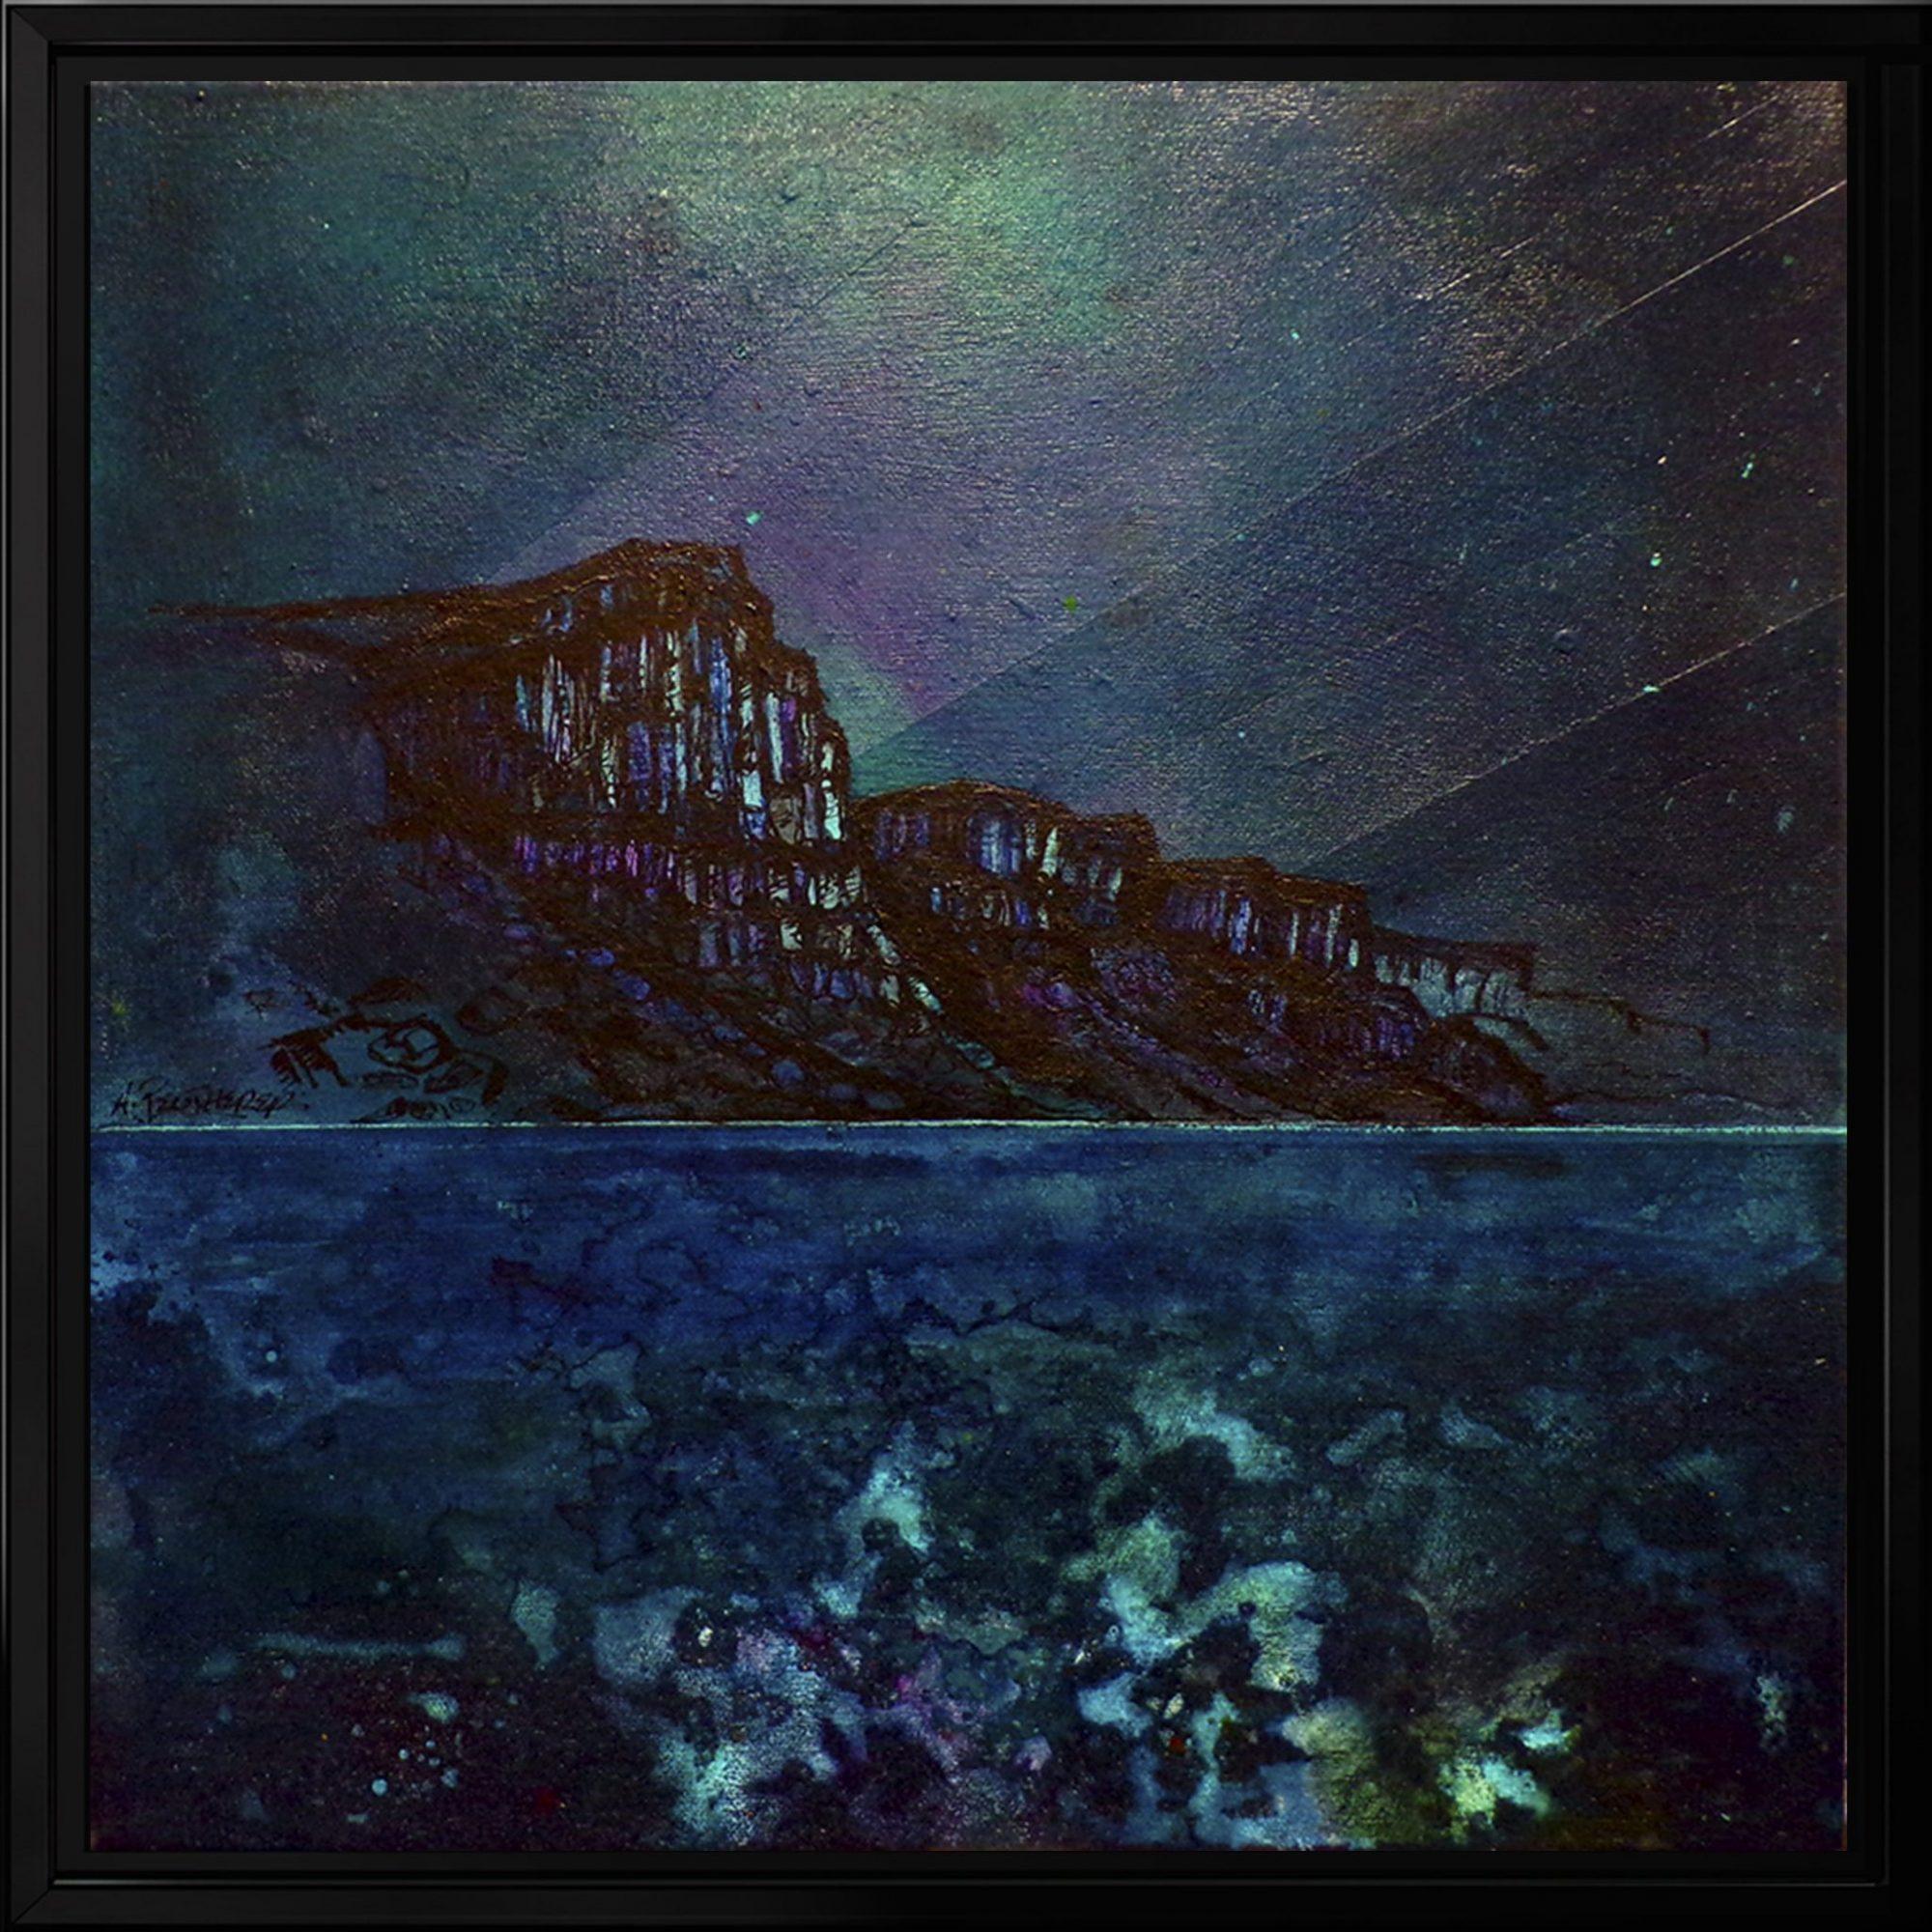 Kilt Rock, Skye - Framed seascape Painting by Scottish artist A Peutherer